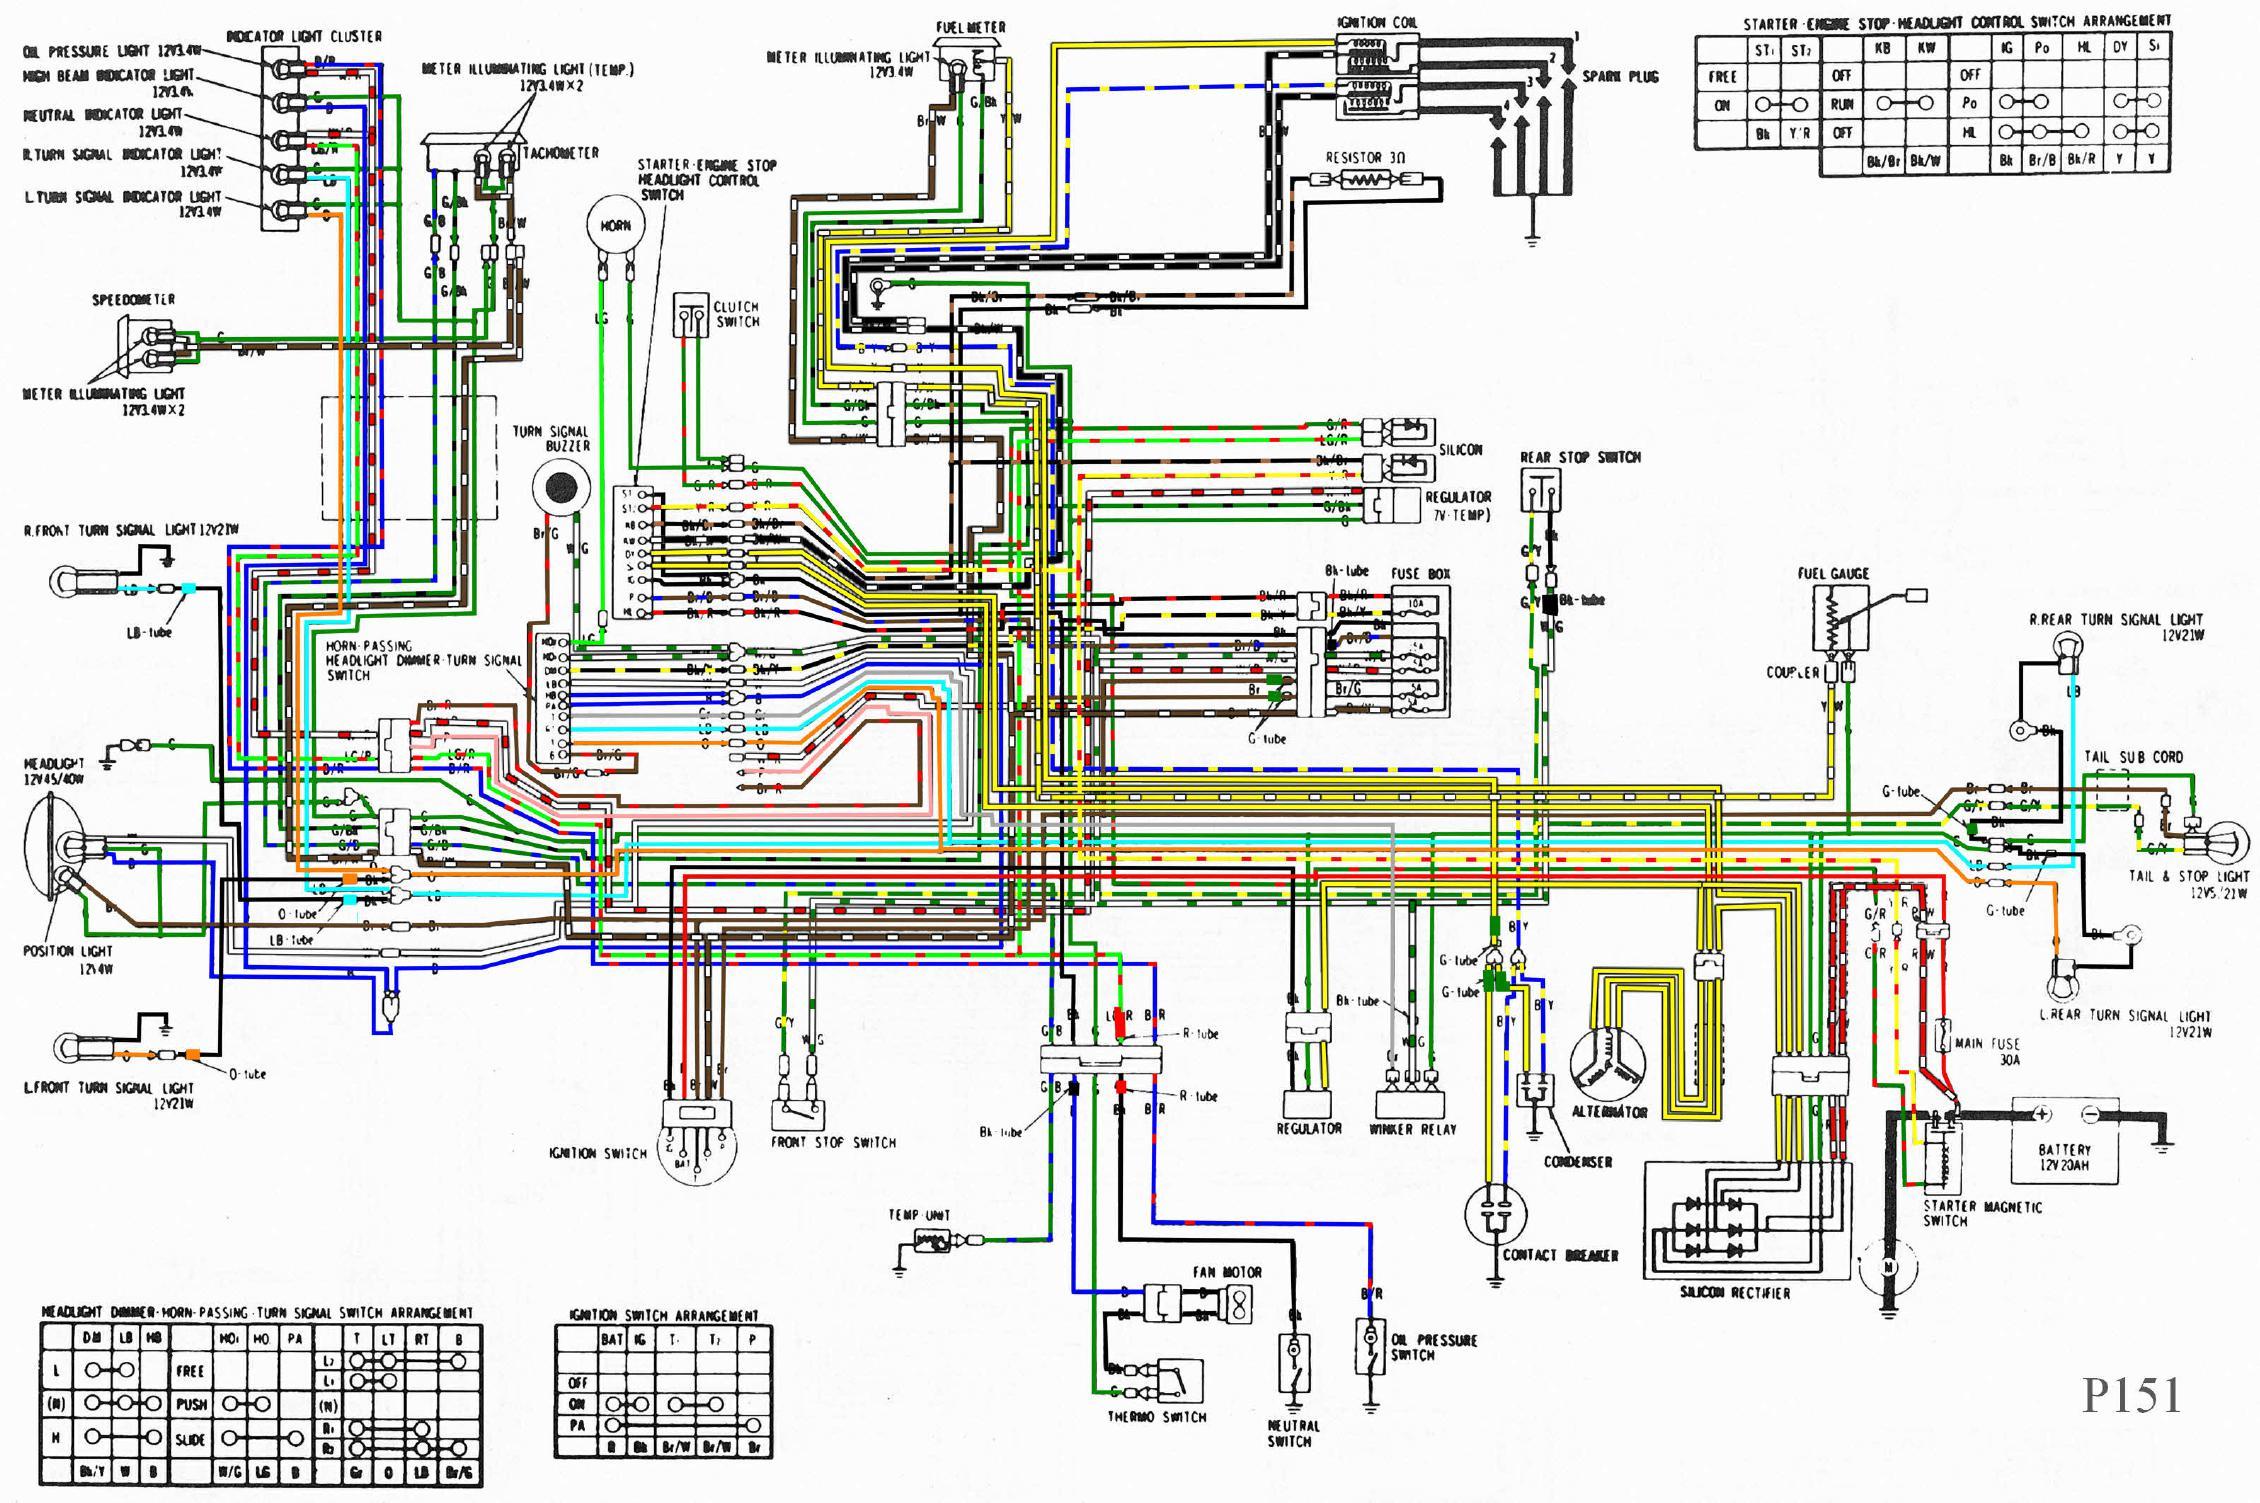 Goldwing Fuel Pump Wiring Diagram Delorean Gl1800 Cruise Schematic For A 1984 Honda Relay Gm